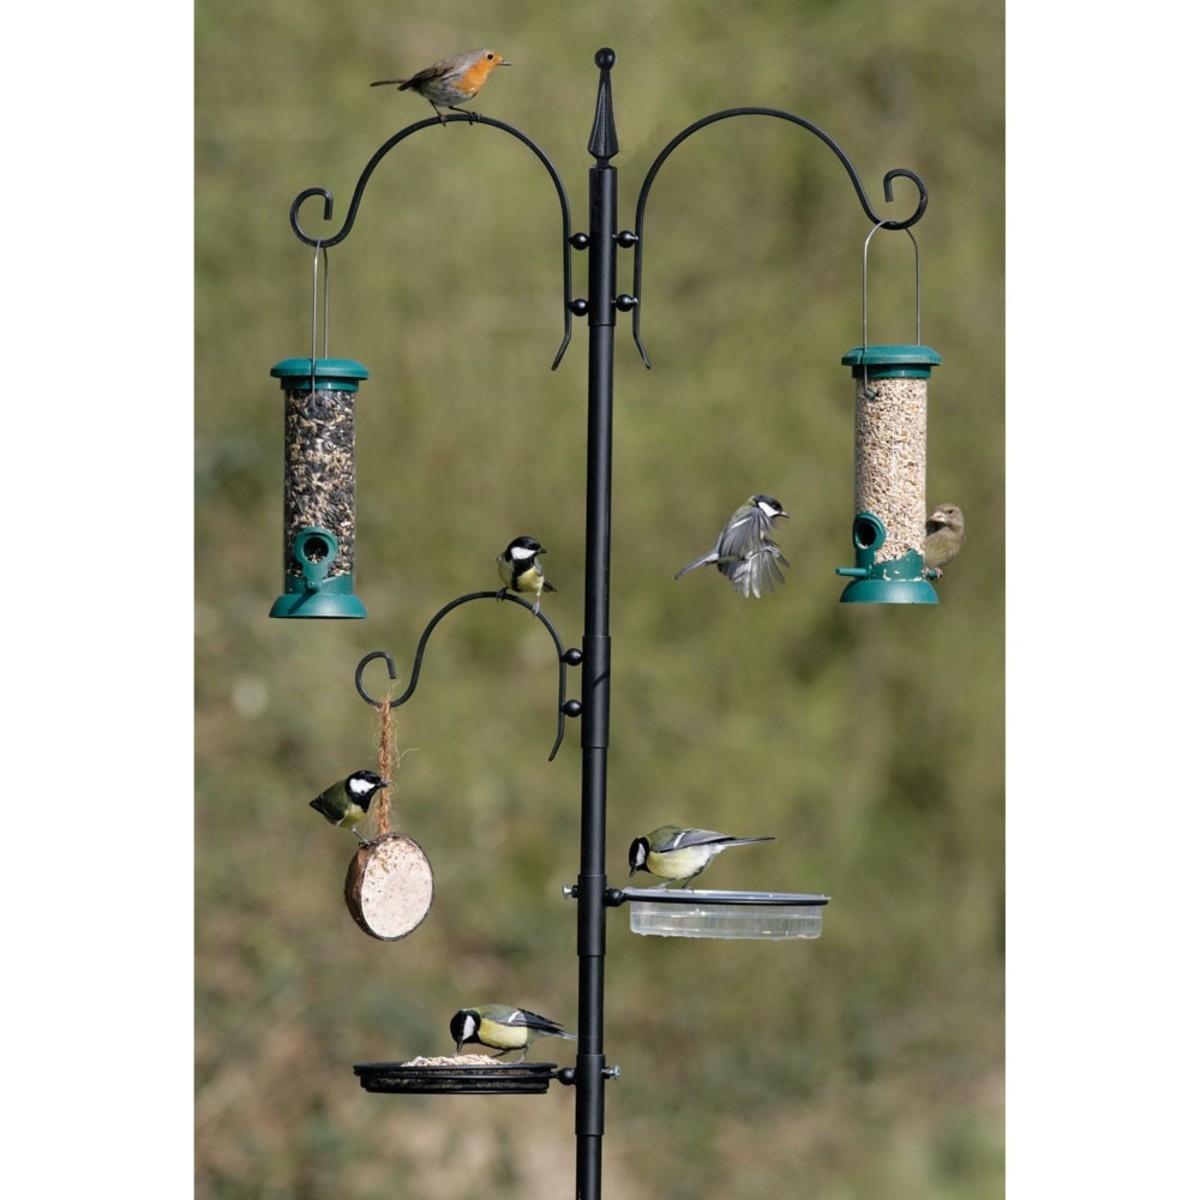 A feeding station for your garden birds